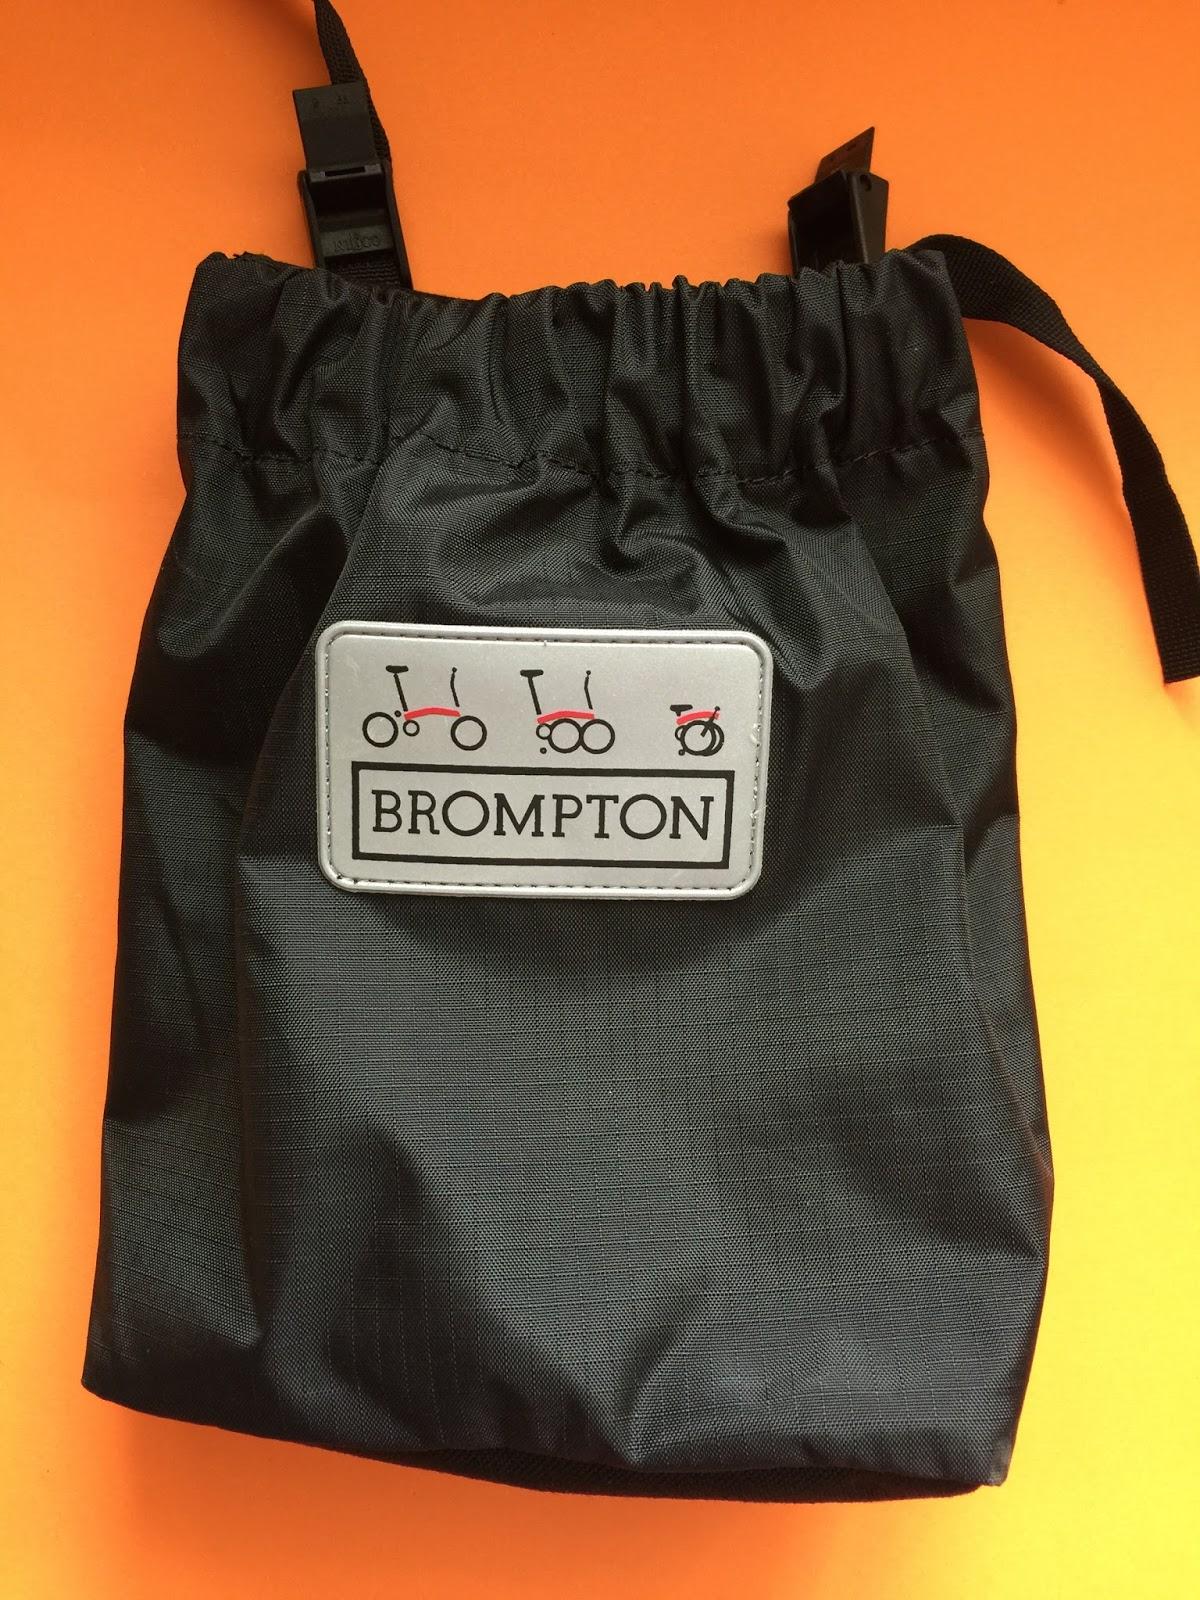 My Orange Brompton Brilliant Brompton Cover With Saddle Bag